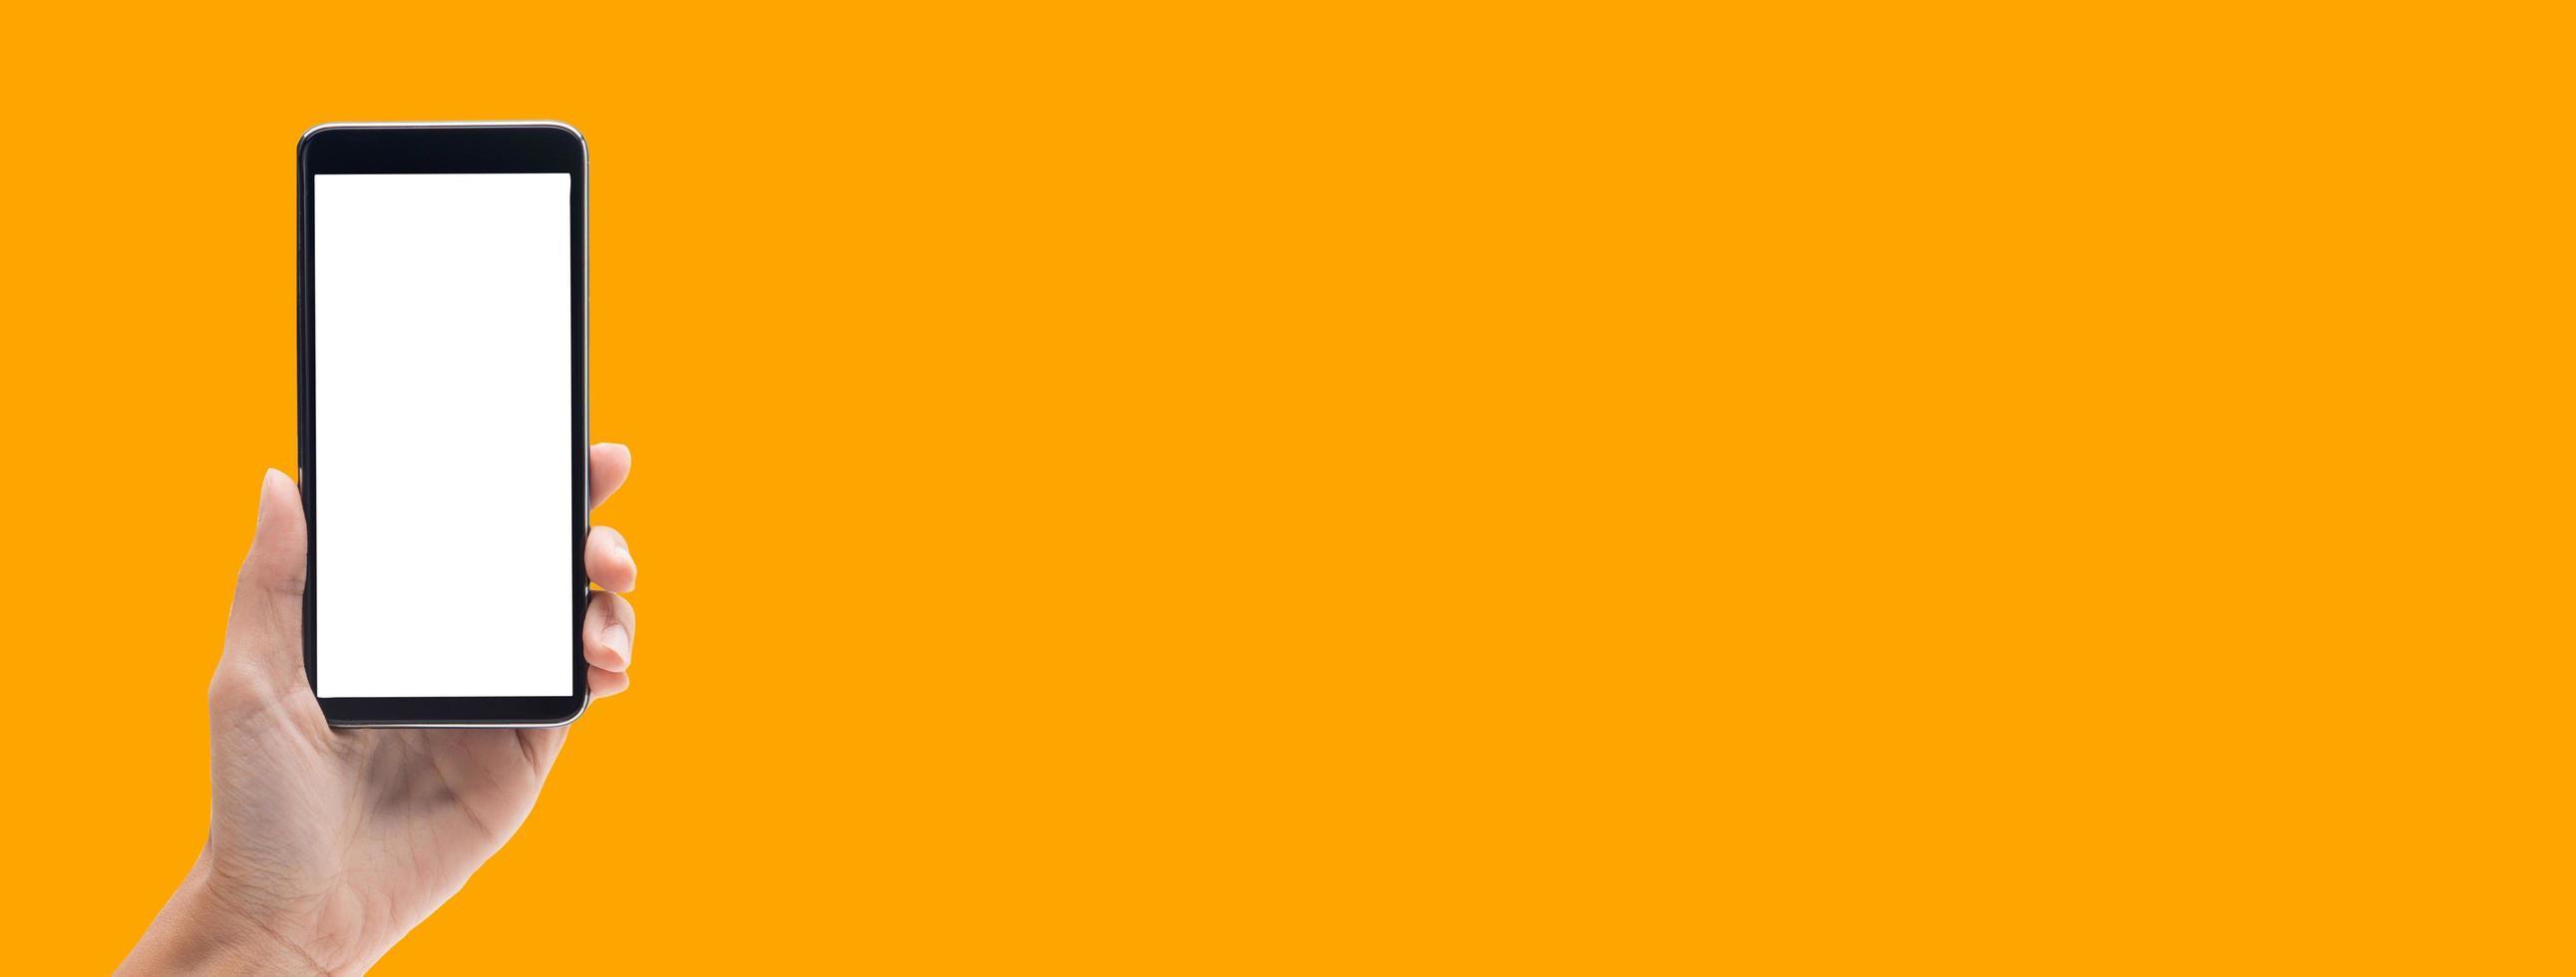 Hand holding smartphone on orange banner background photo